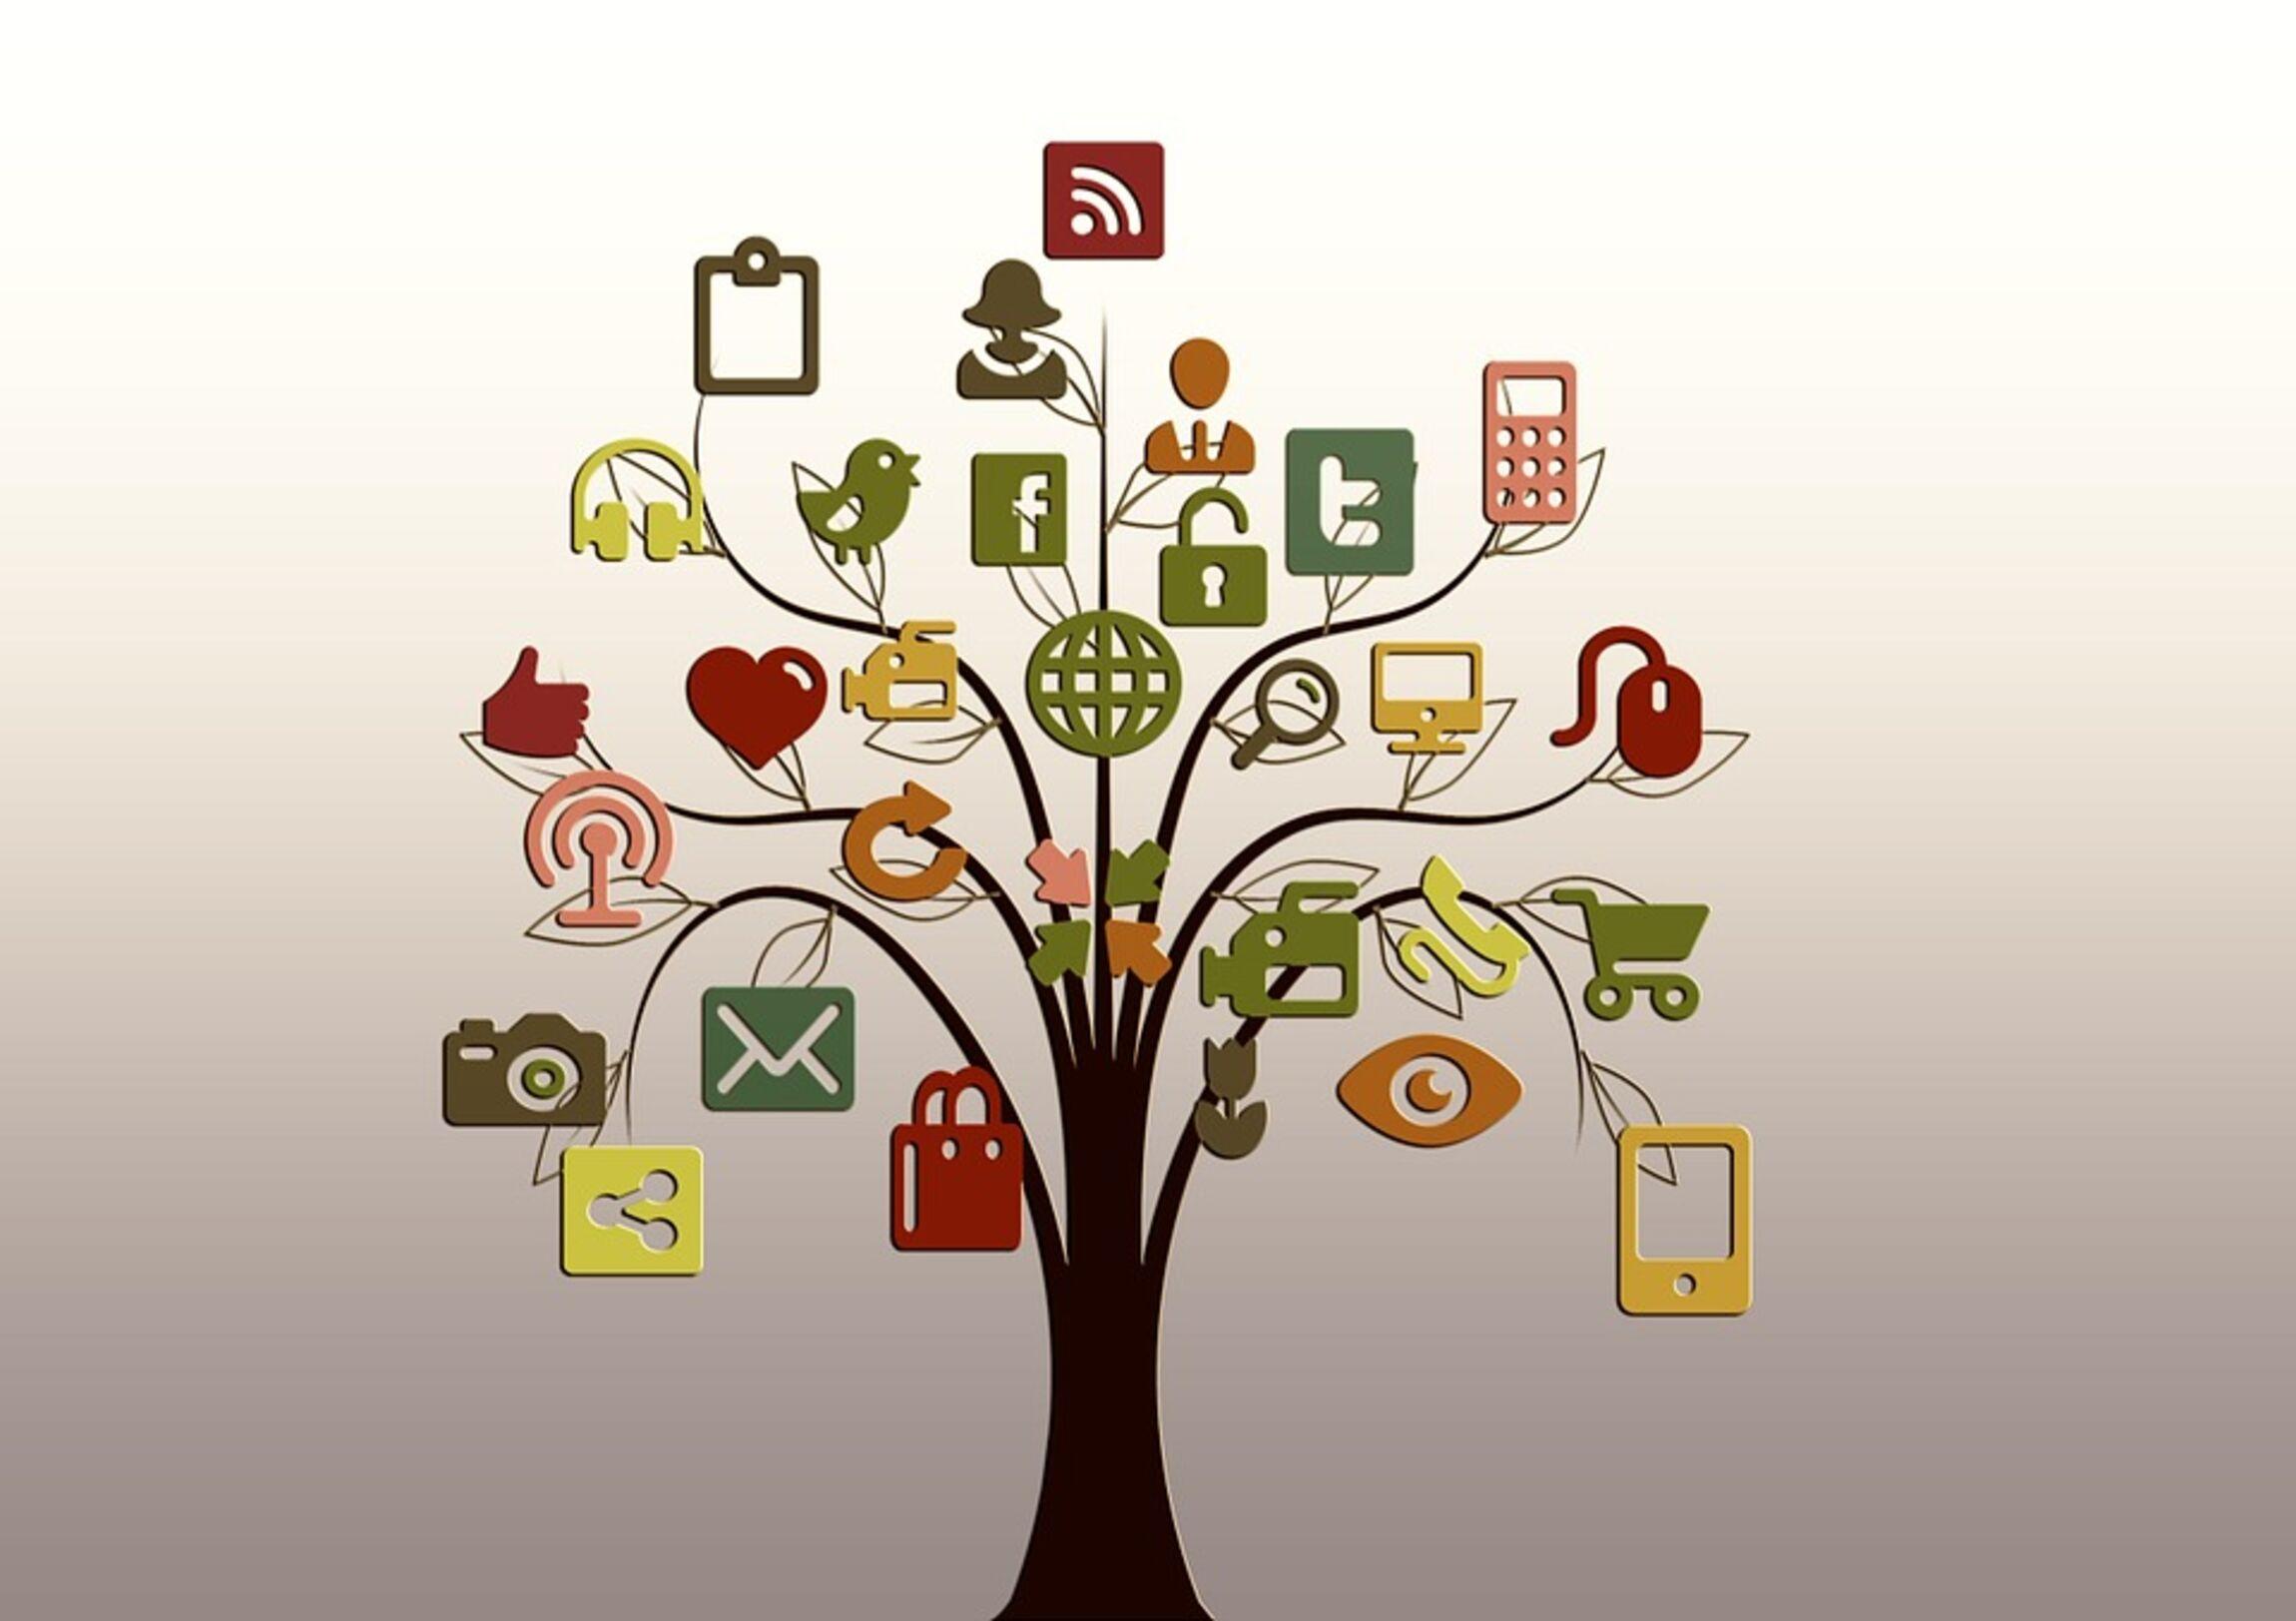 Netzwerkbaum